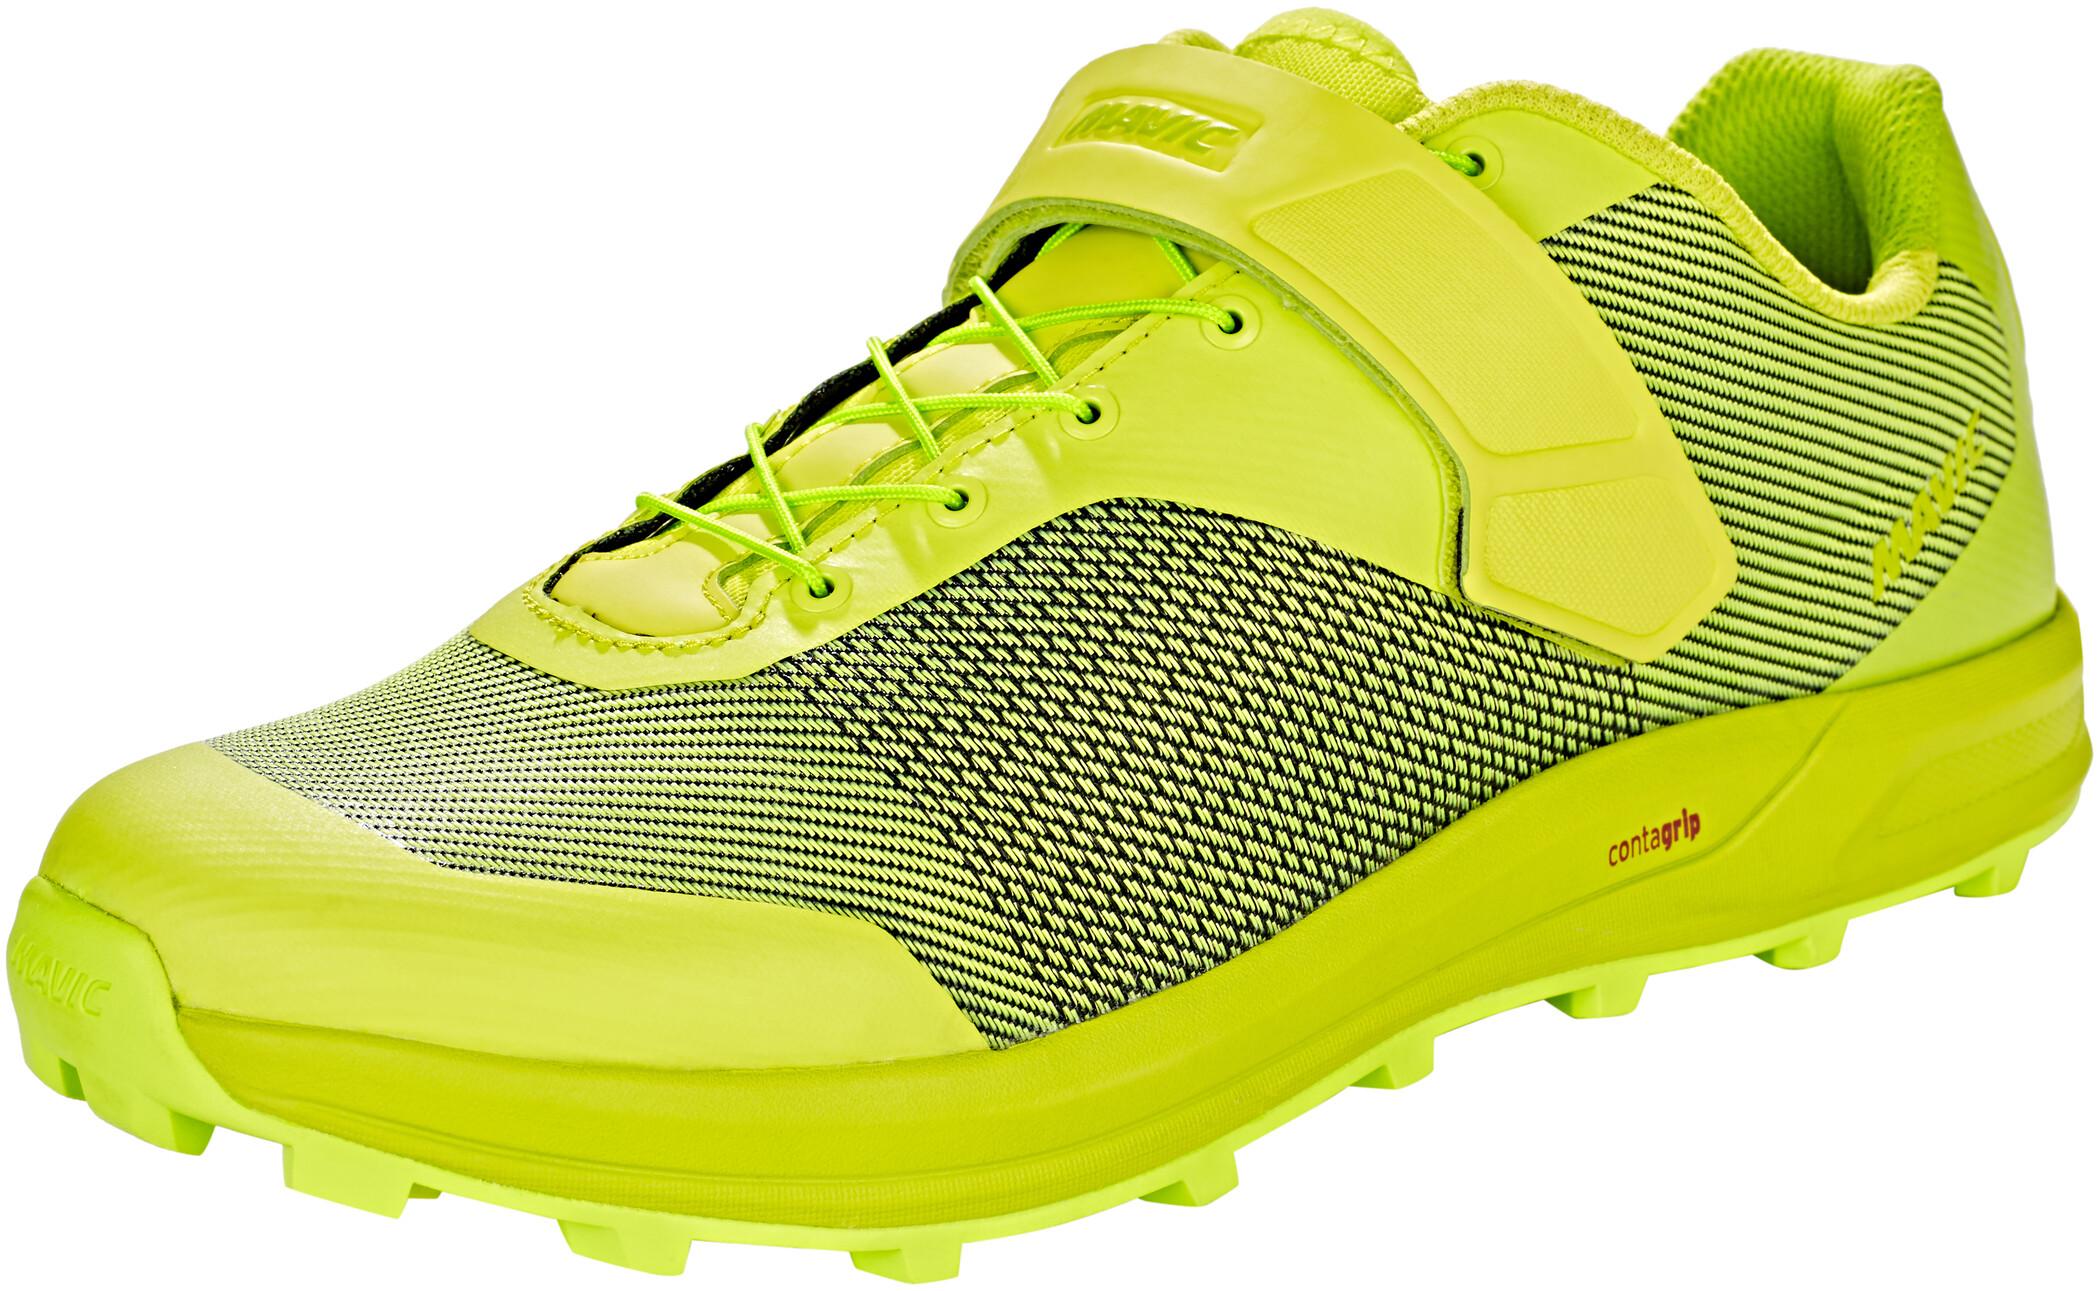 Details about Ecco Yak Leather Water Sport Sandals Shoes Cinch Laces Men's Size 42